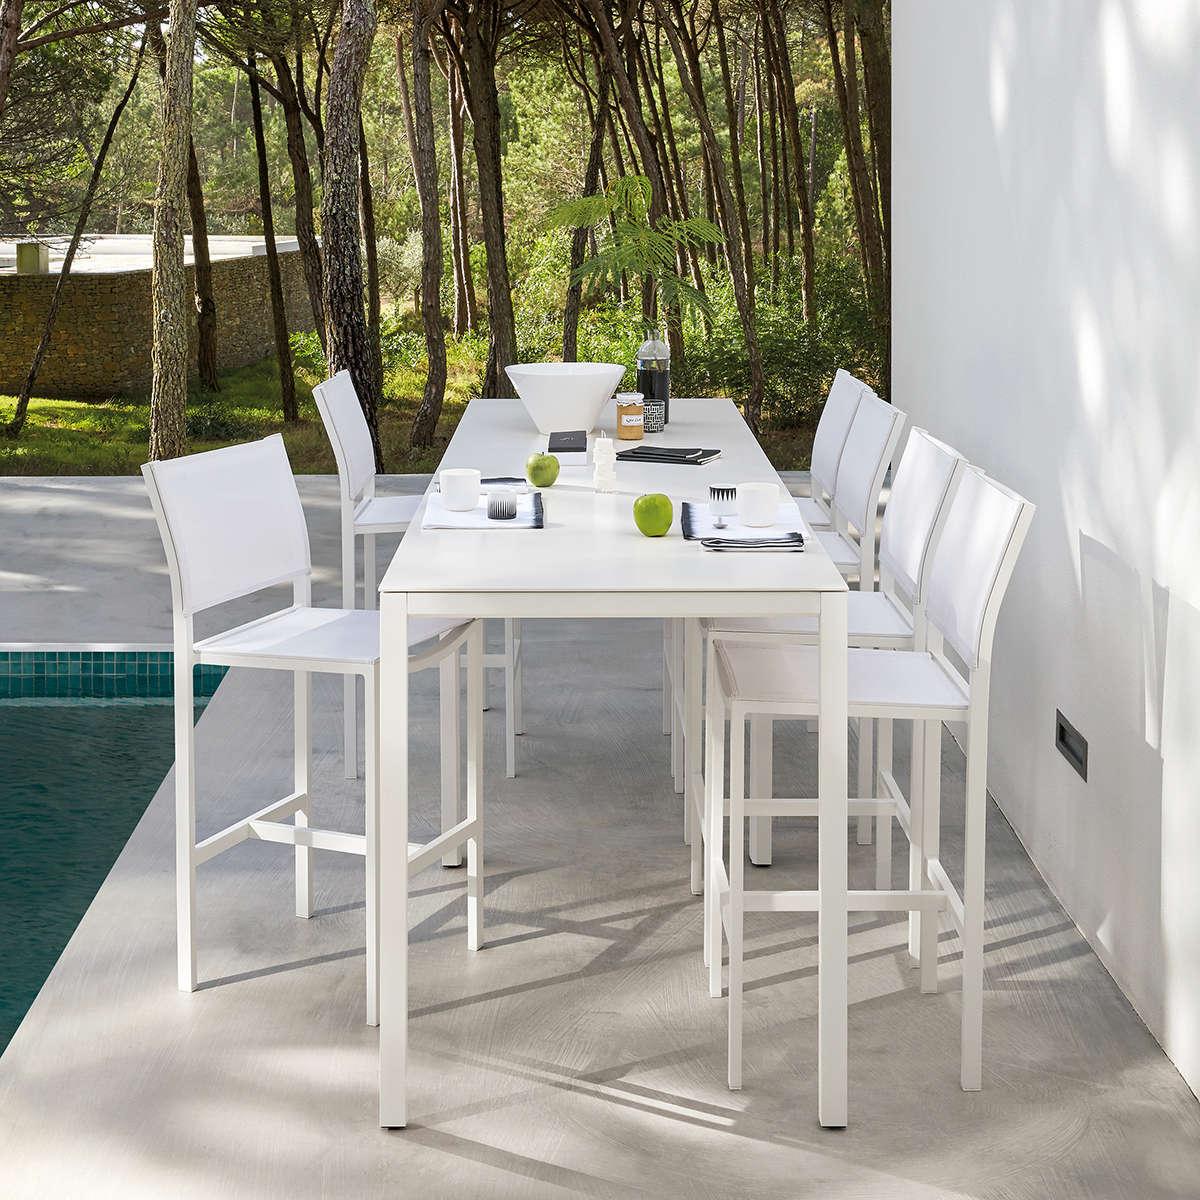 Manutti Quarto Bar Table Sized